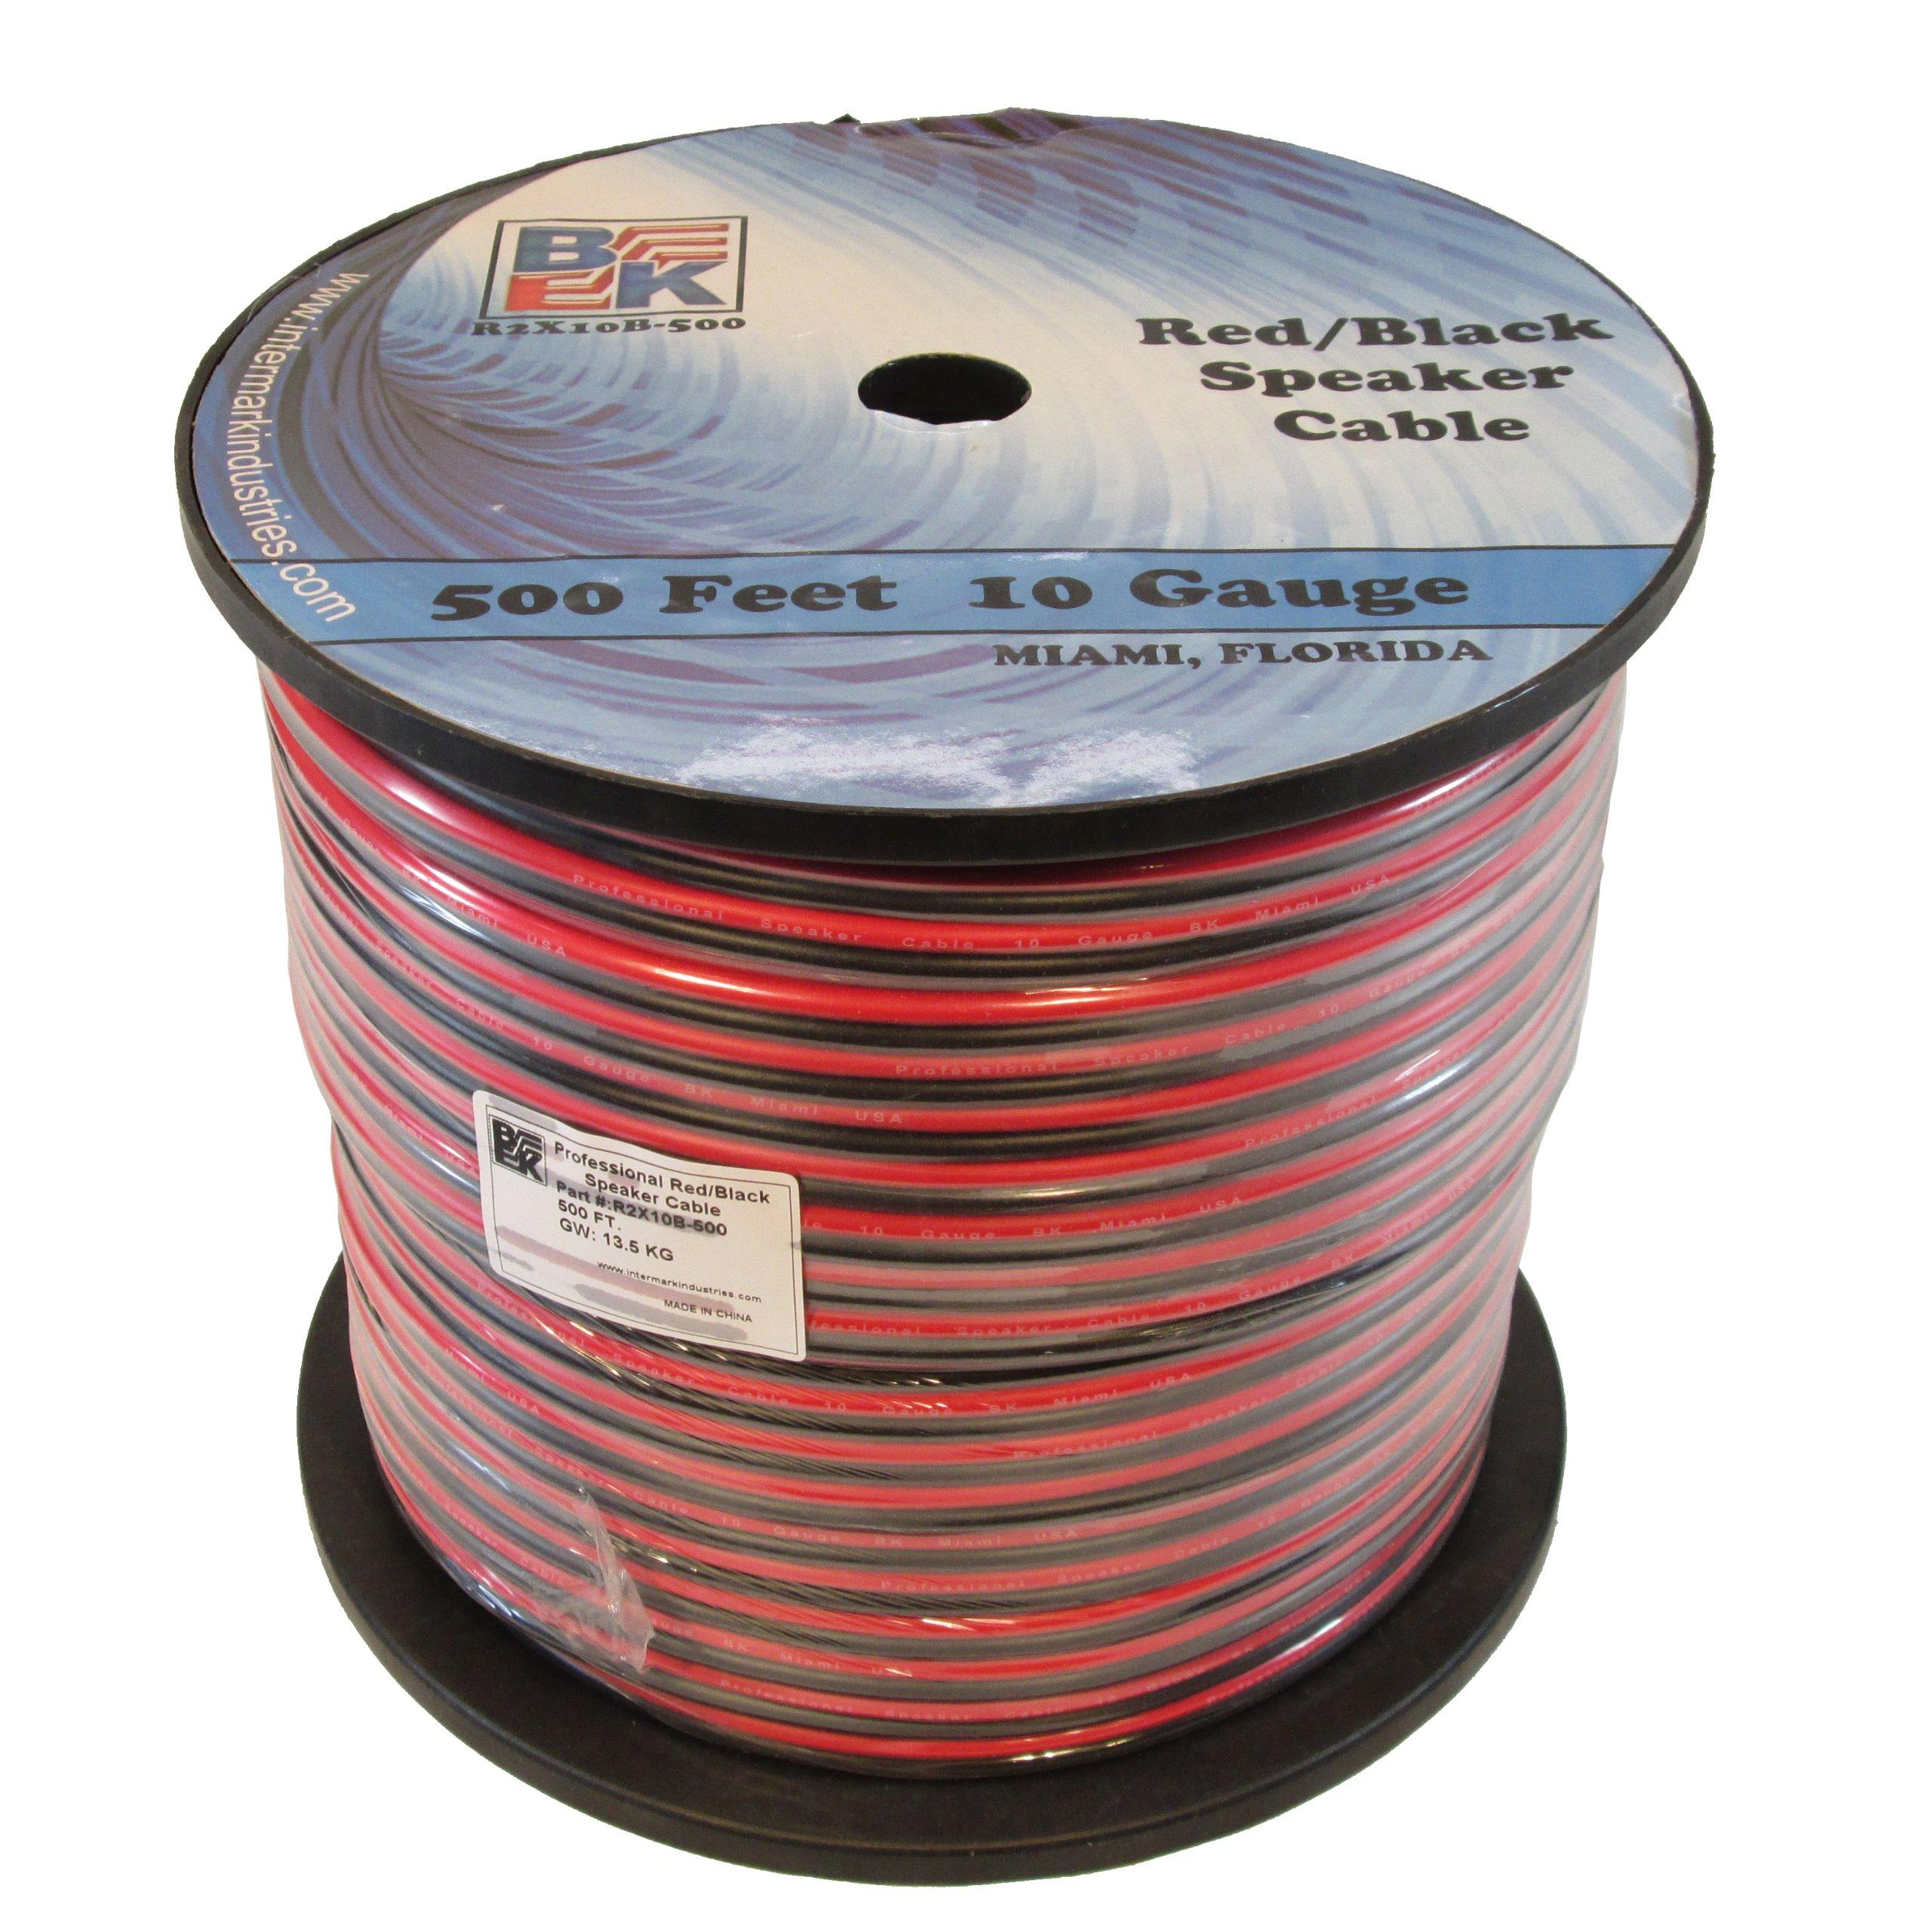 Blast King IR2X10B-500 10 Gauge 500-Feet Speaker Wire